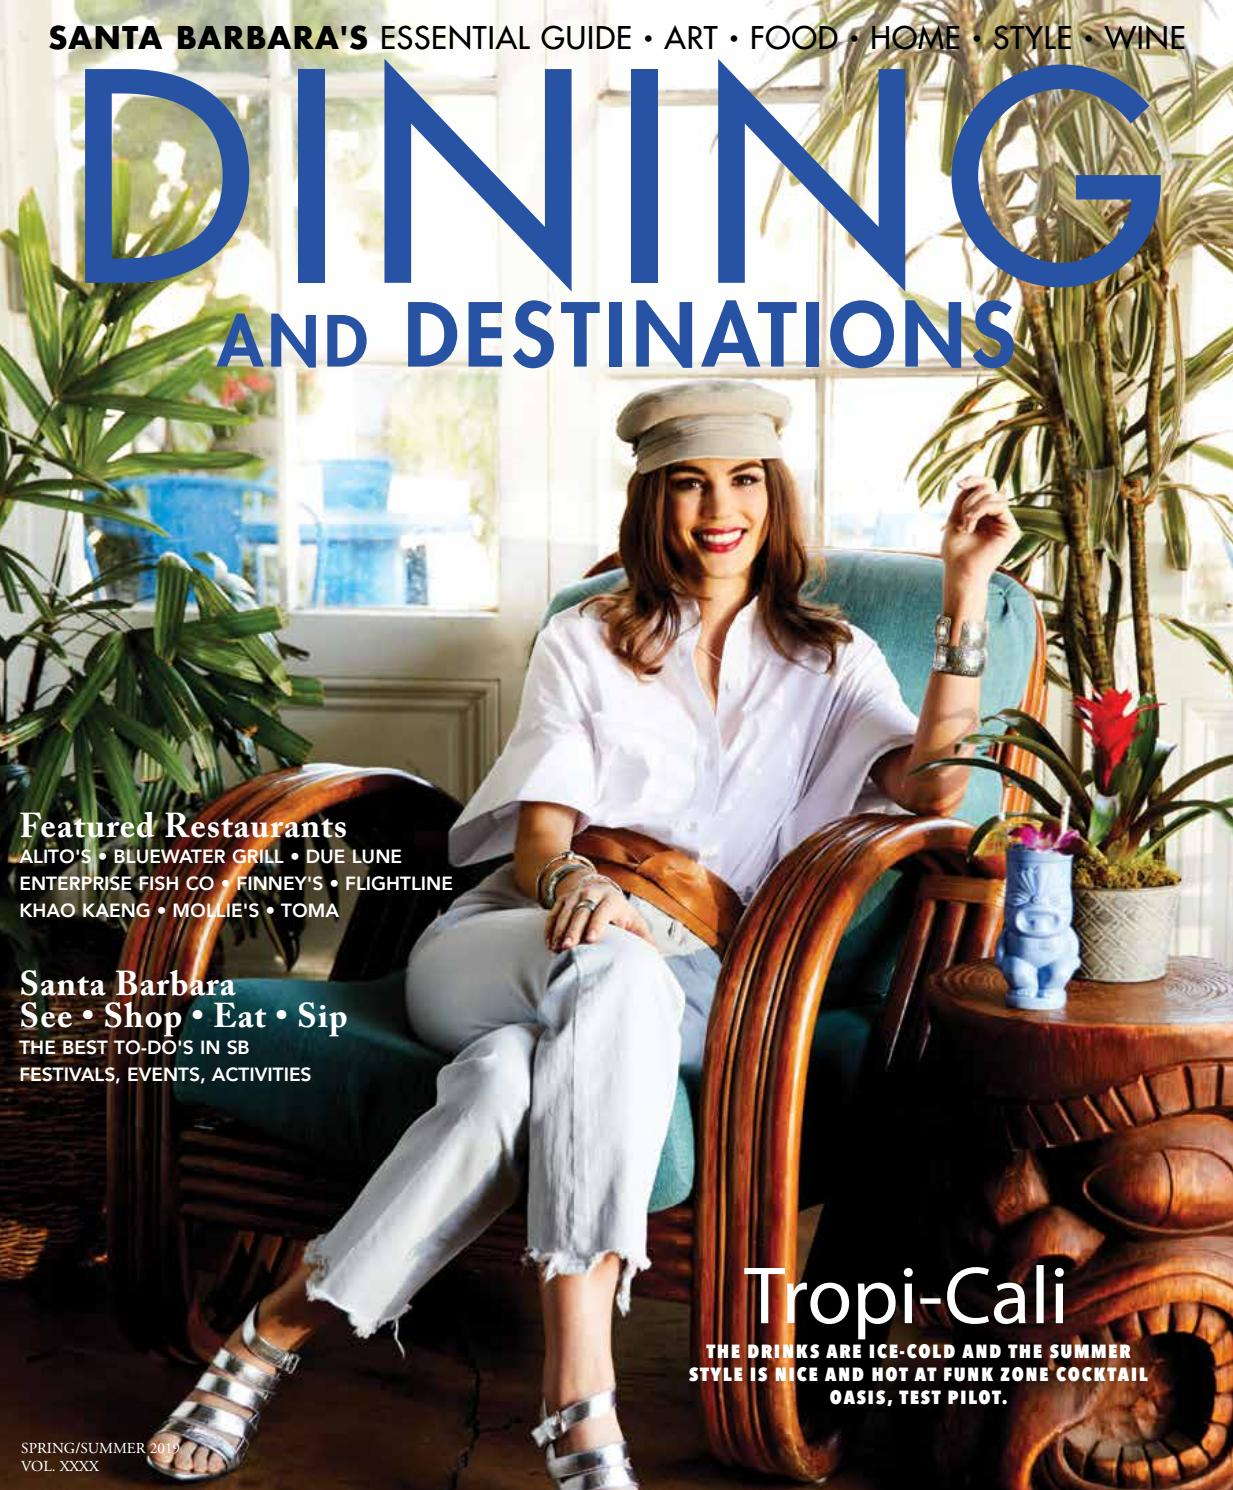 Santa Barbara Dining And Destinations Spring Summer 2019 By Santa Barbara Dining And Destinations Issuu